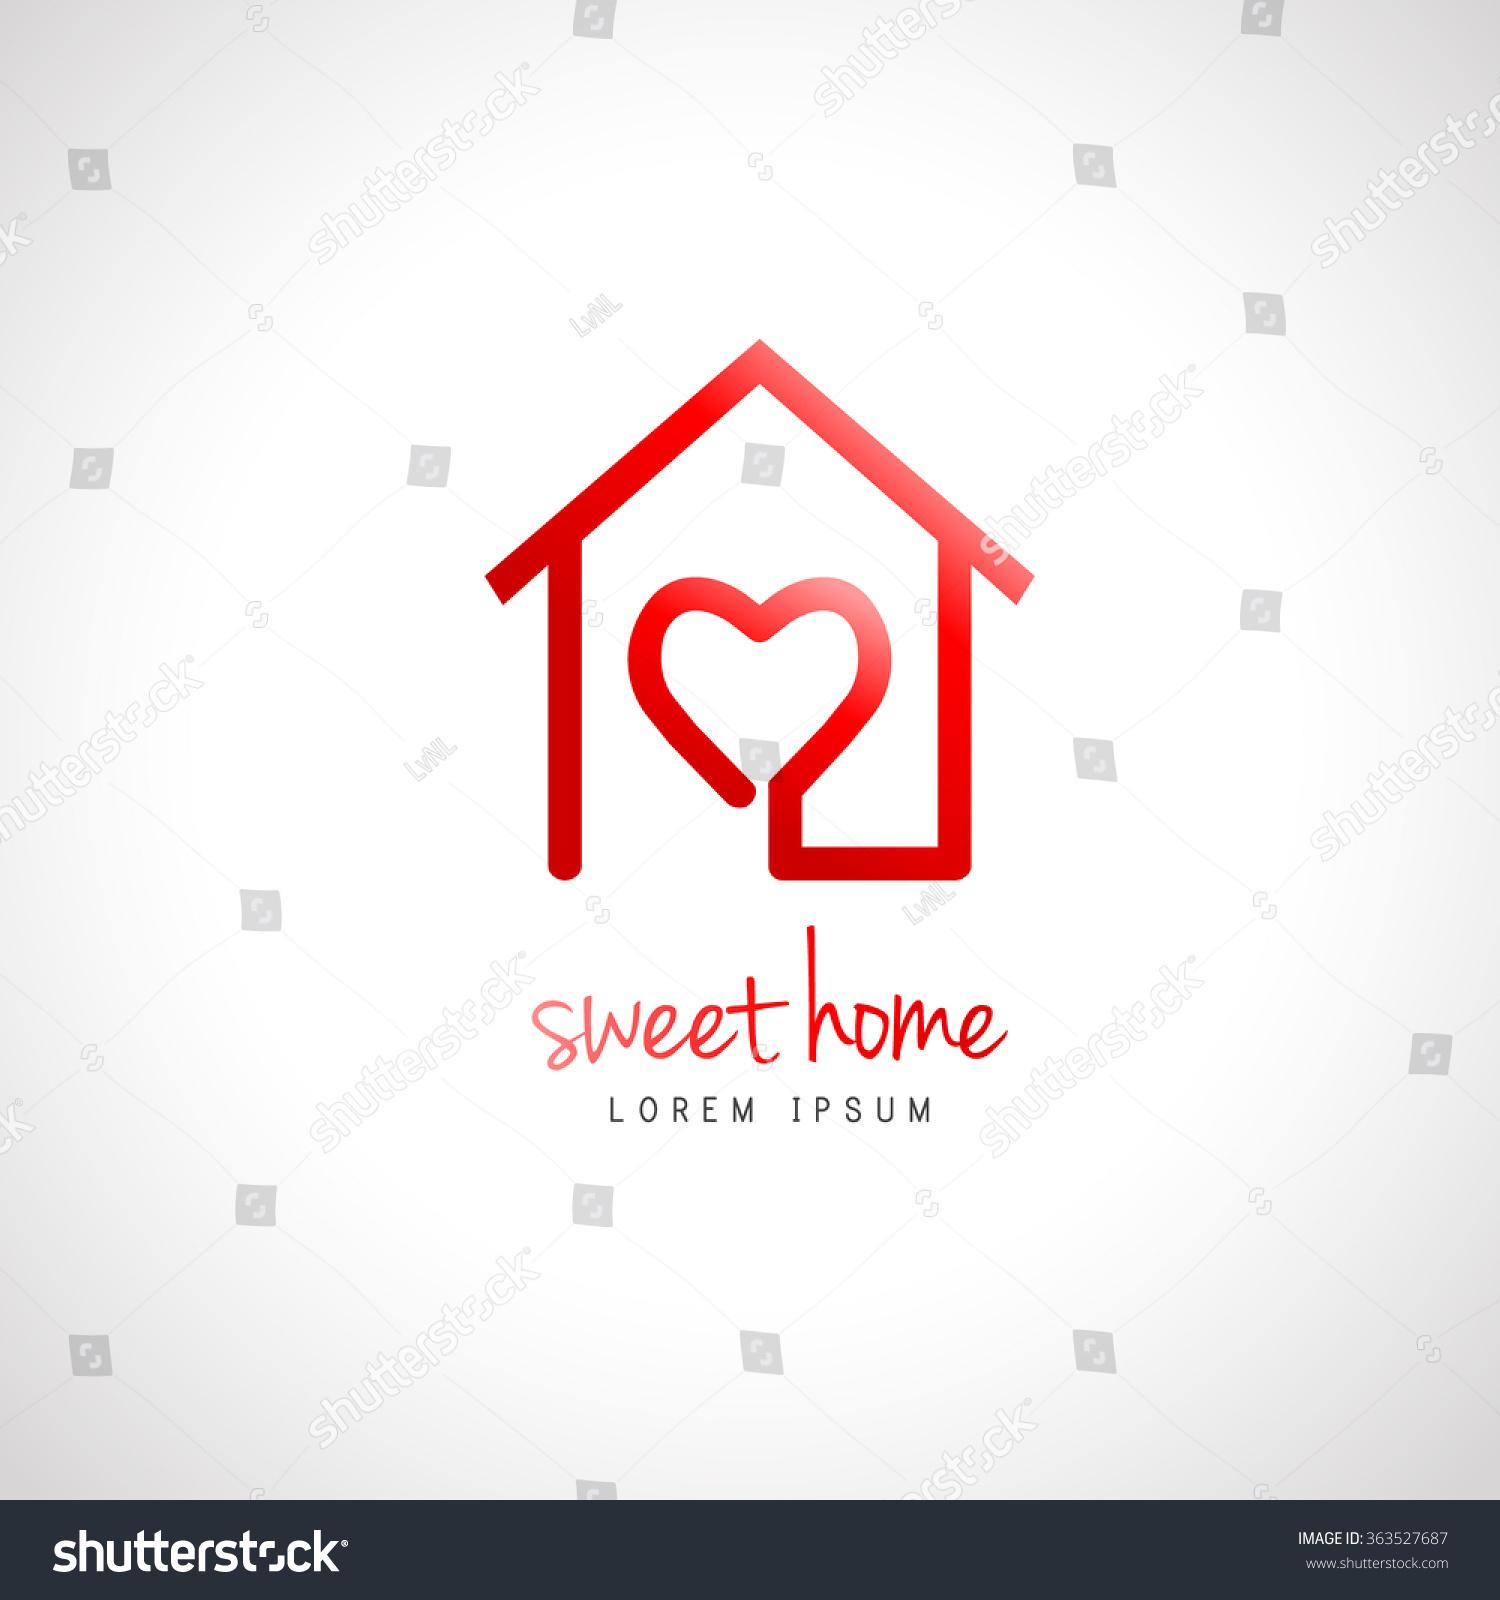 Abstract Home Logo Heart Inside House Stock Vector 363527687 ...